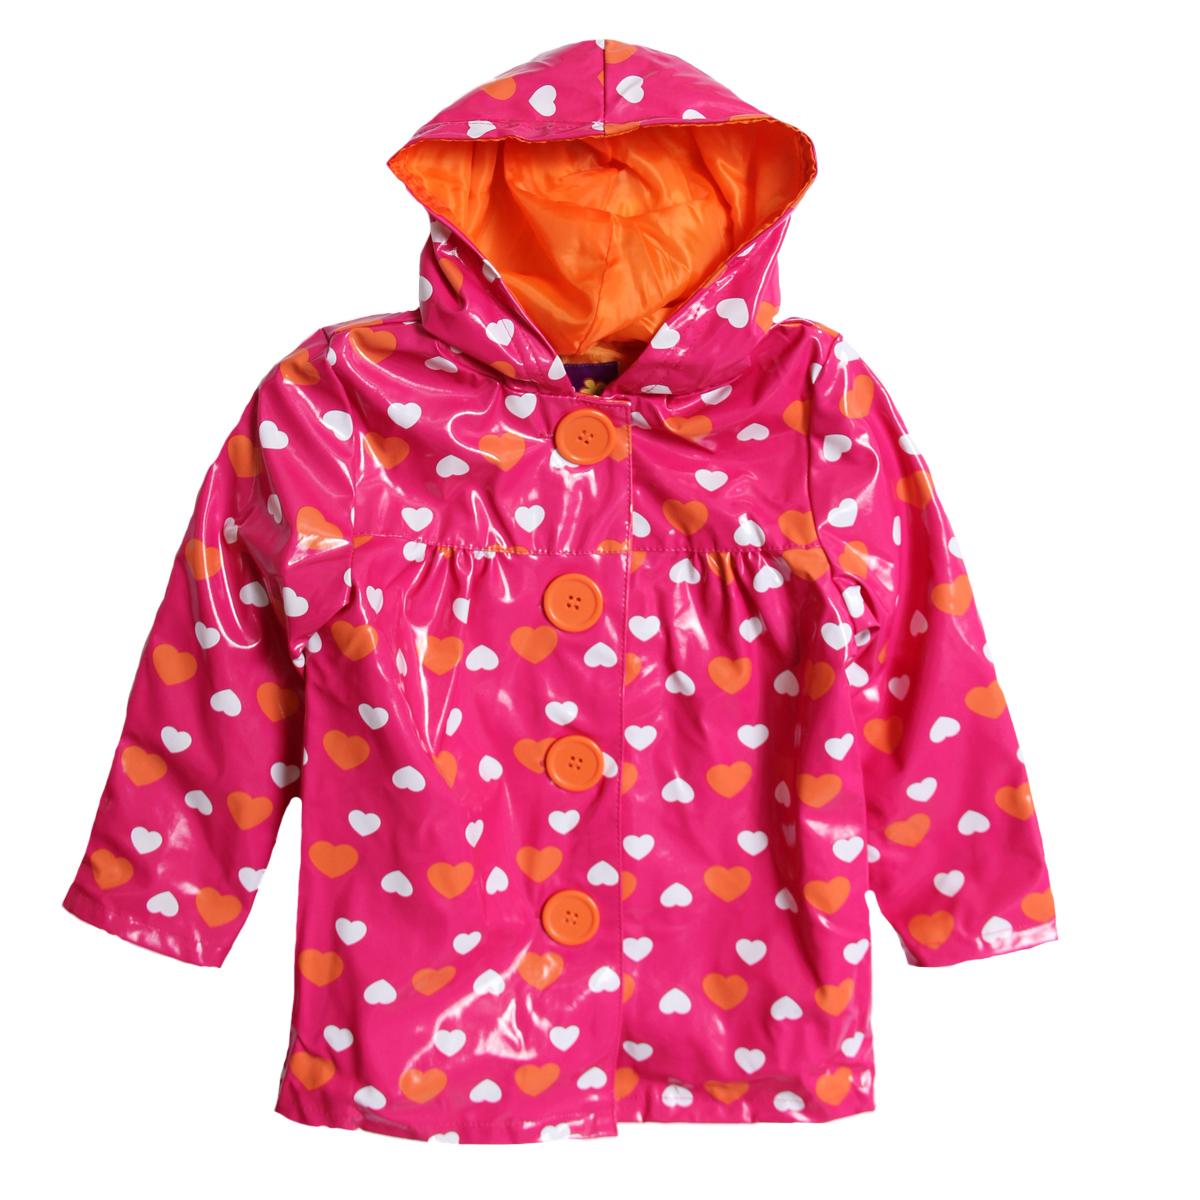 Pink Platinum Baby Girls' Pink Orange Heart Polka Dot Hooded Raincoat Jacket at Sears.com